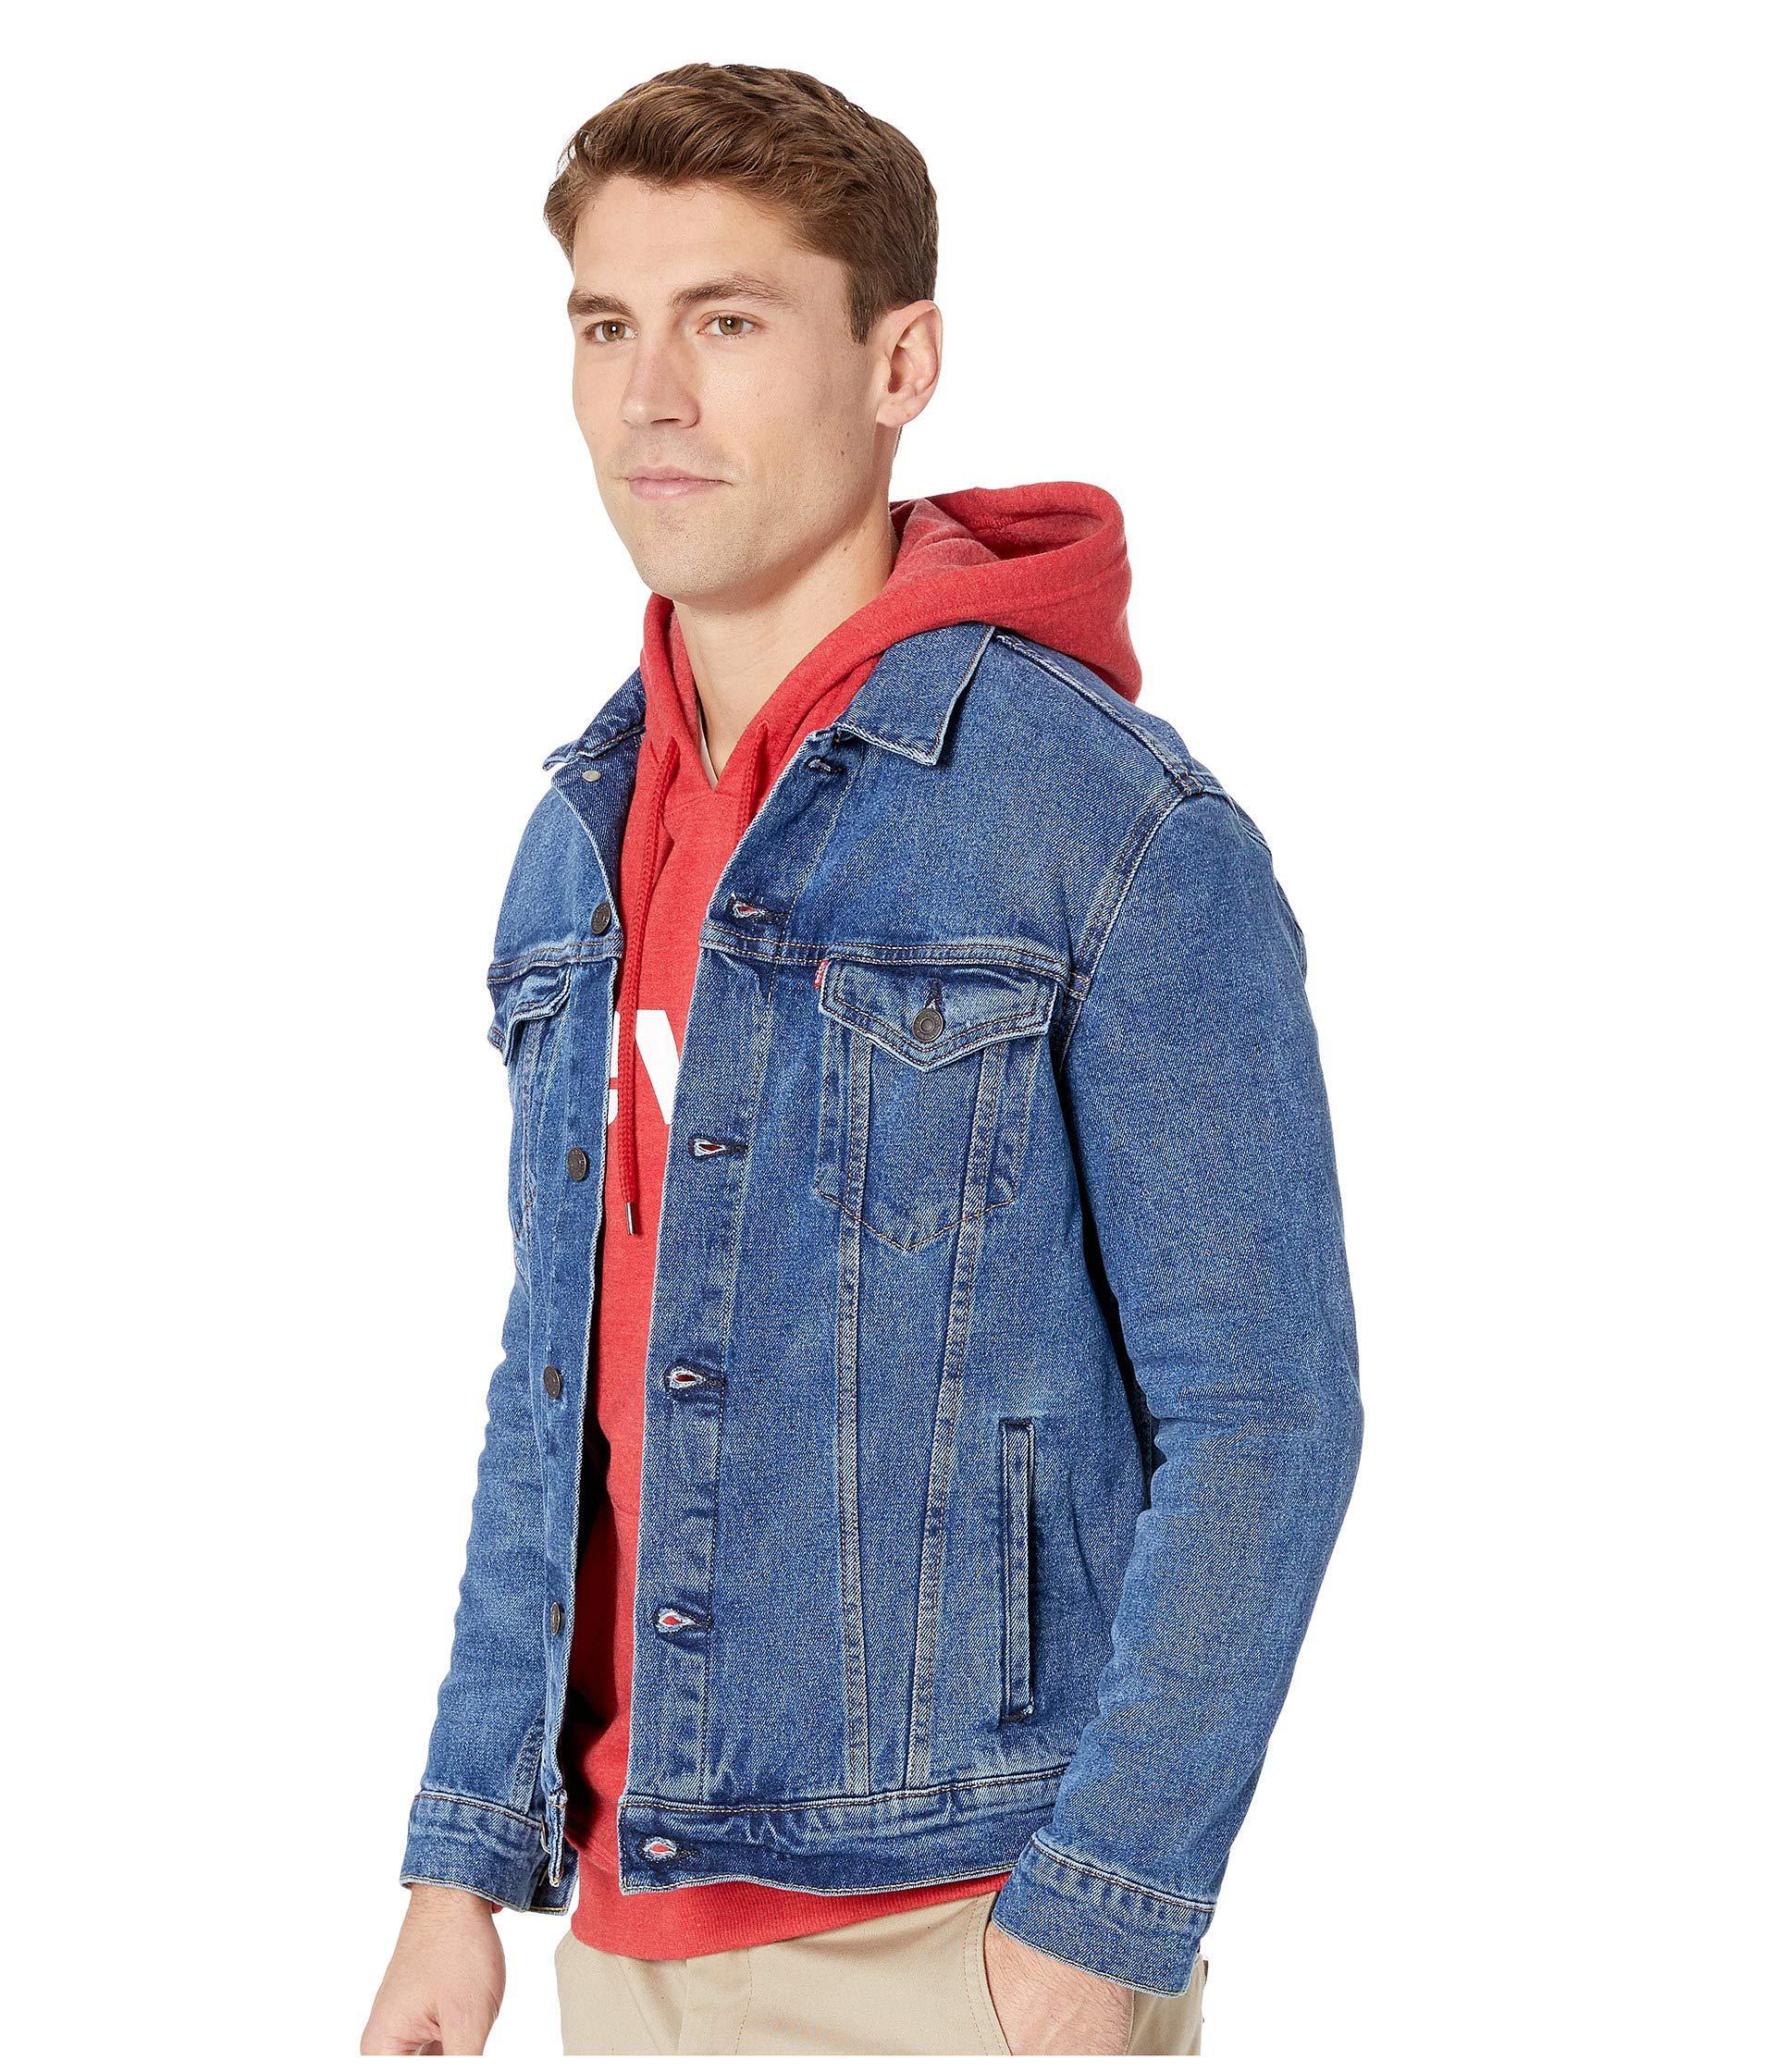 bb01e12f225 Lyst - Levi s Levi s(r) Mens The Trucker Jacket (dark Blue) Men s Jacket in  Blue for Men